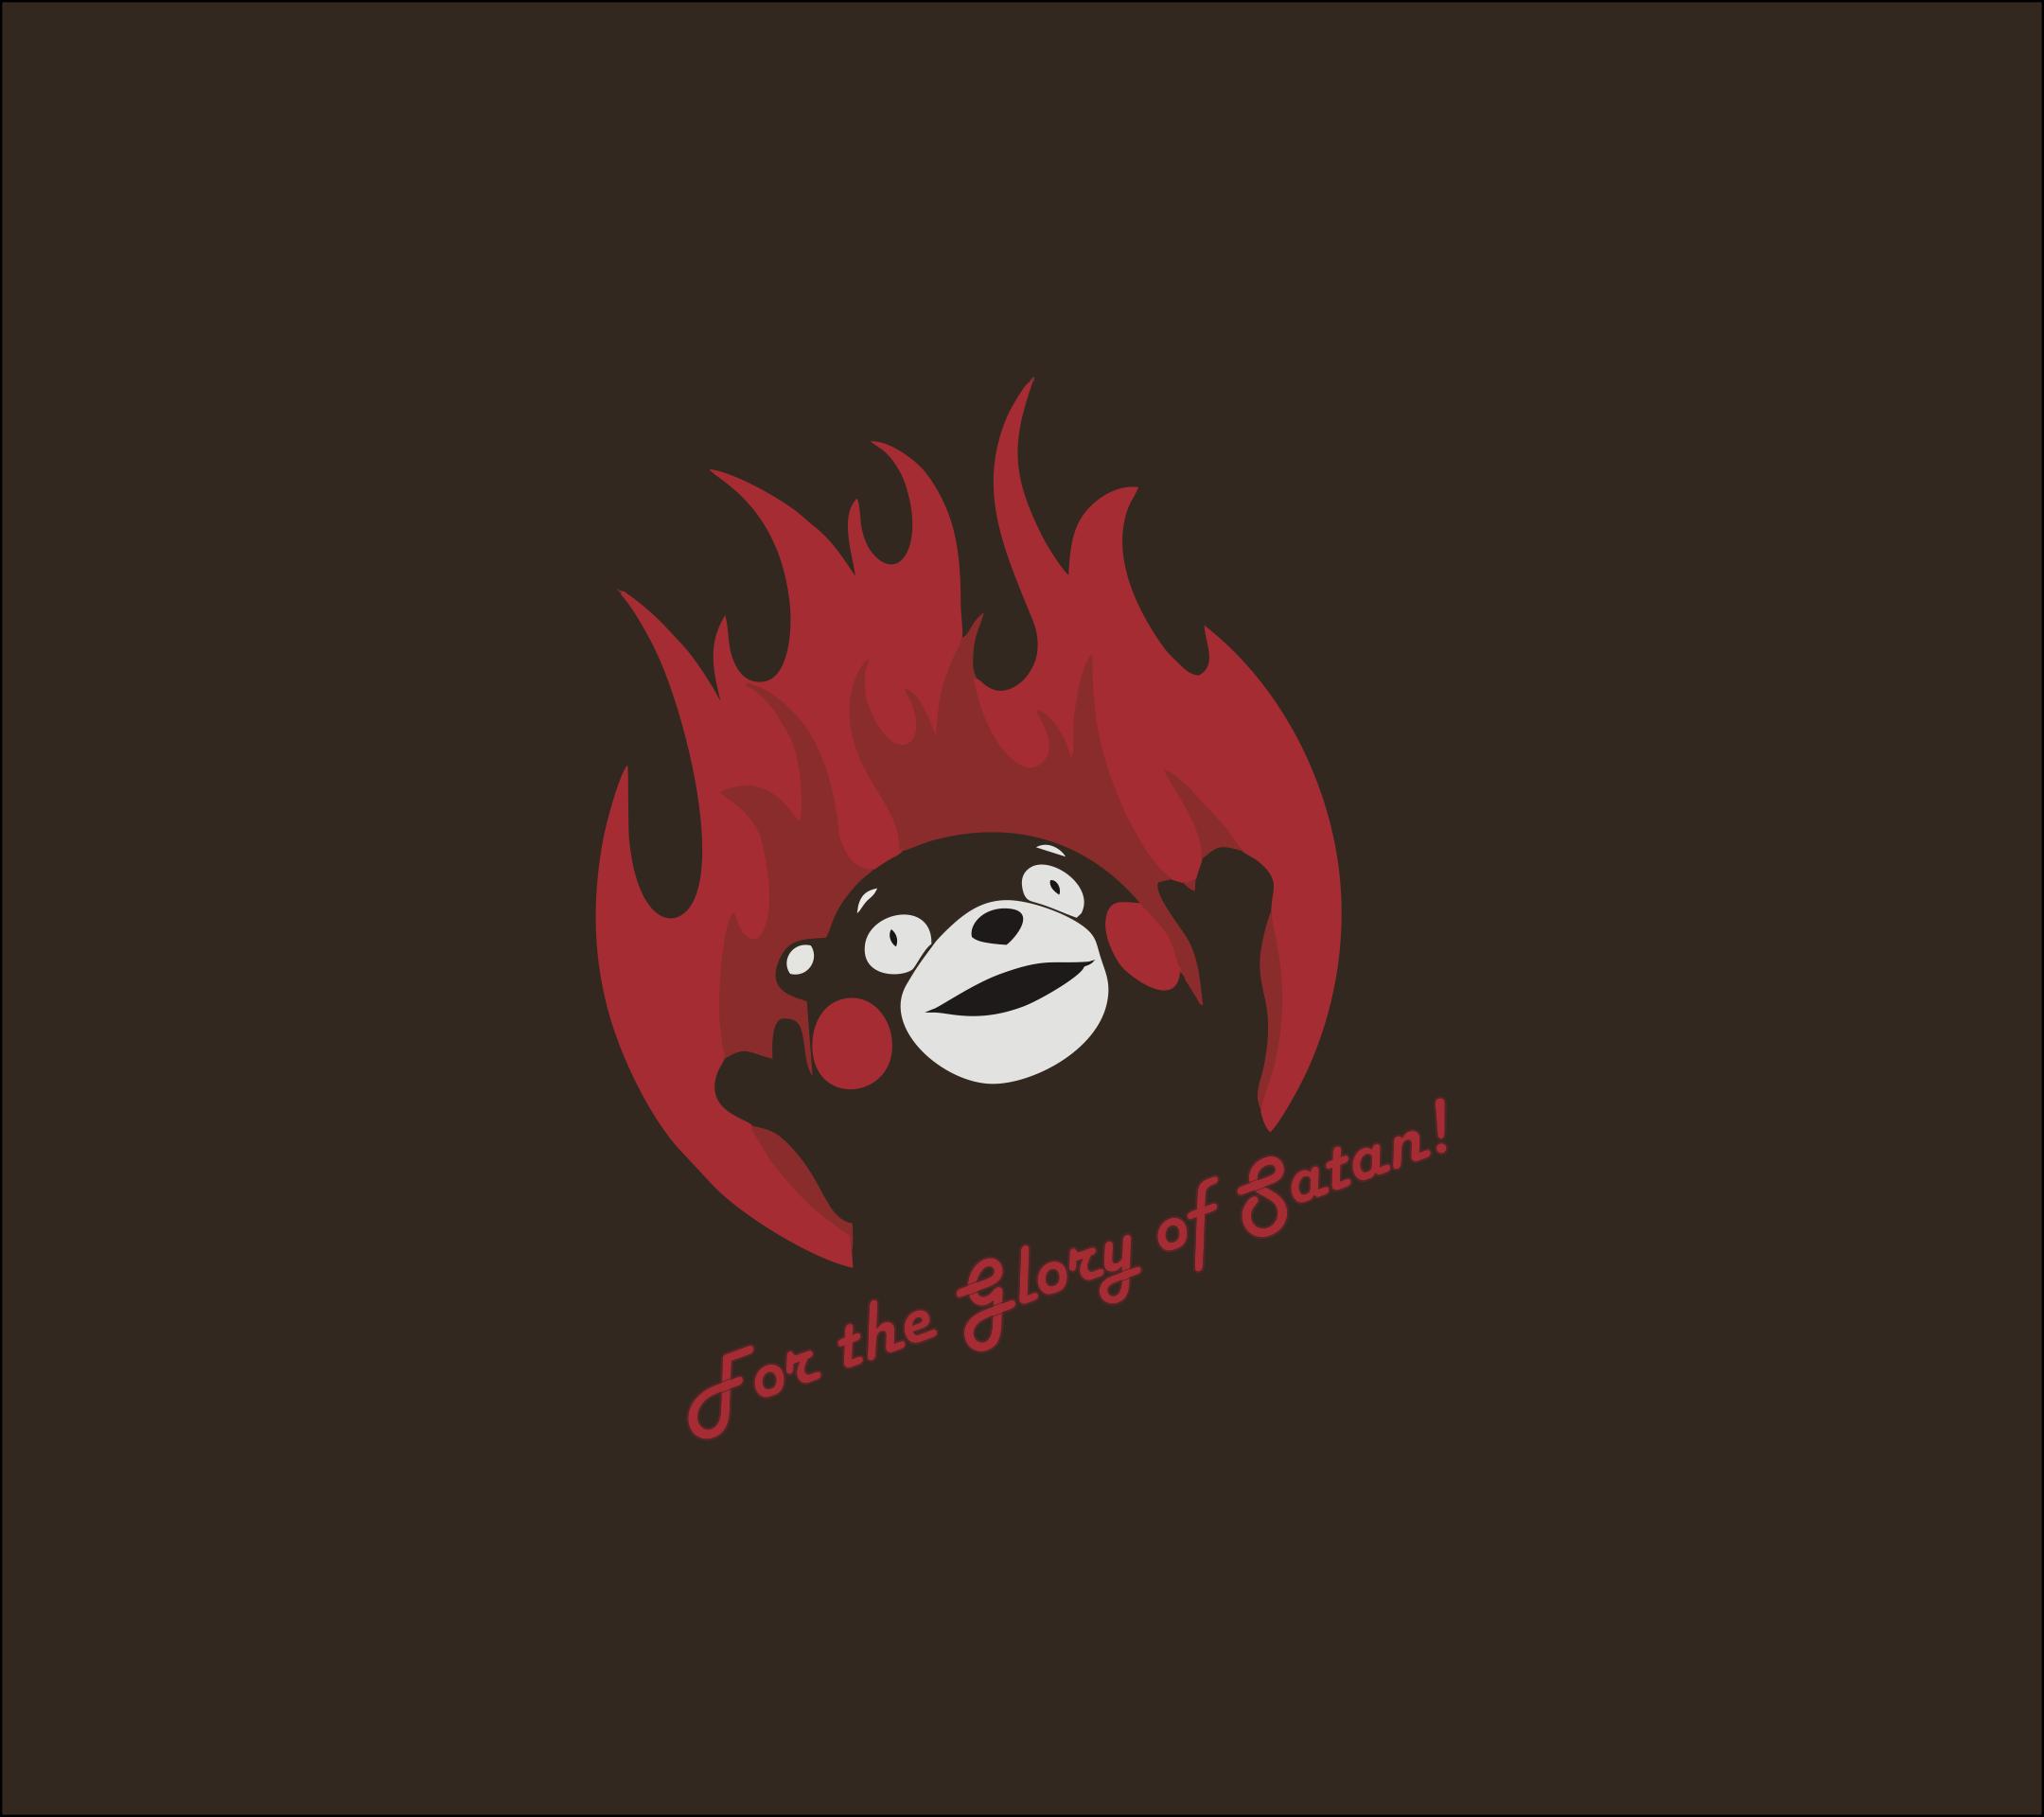 General 2160x1920 phone smartphone kumamon fire Satan